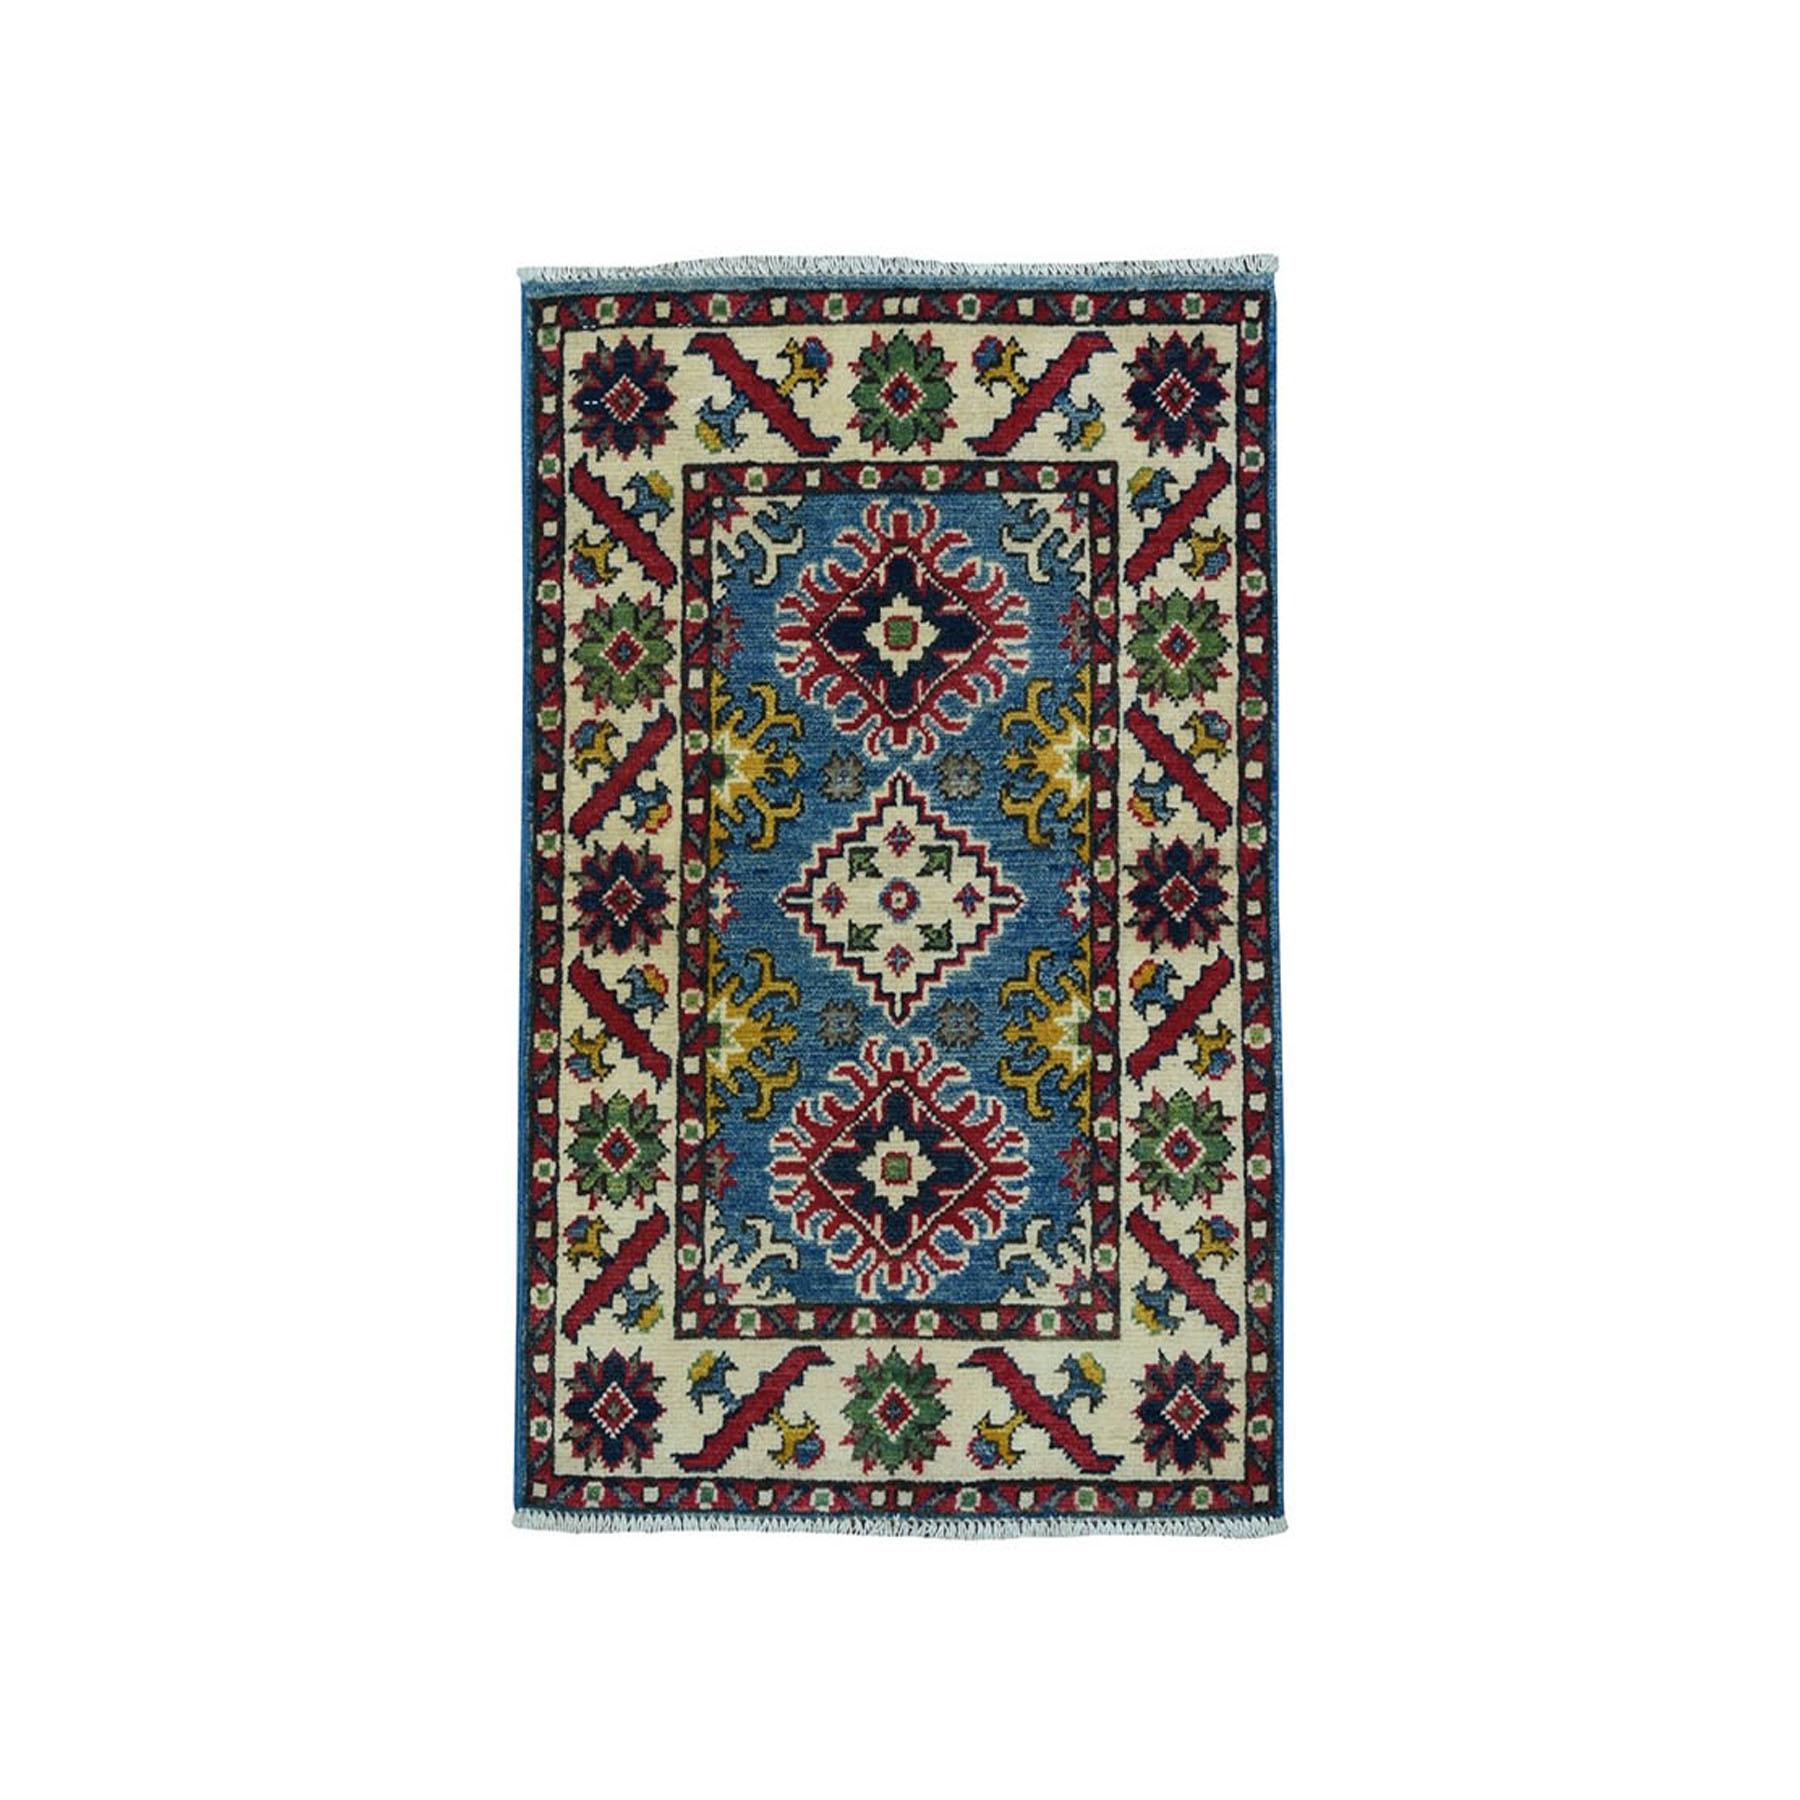 "2'X2'9"" Blue Geometric Design Kazak Pure Wool Hand-Knotted Oriental Rug moae0998"